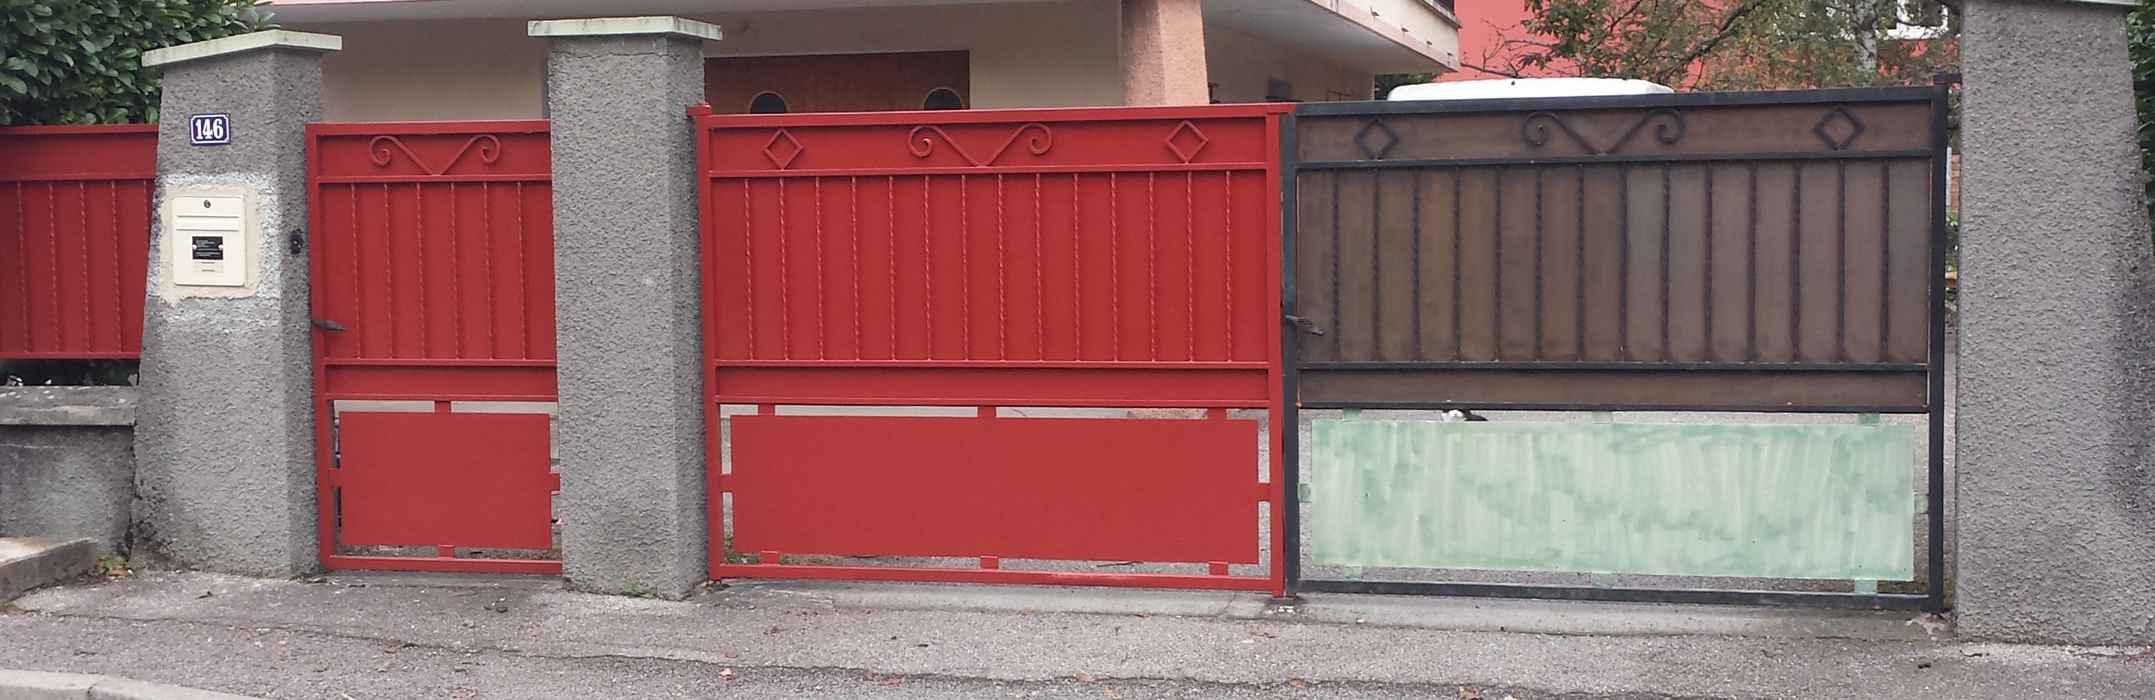 portail-peinture-vizille-renovation